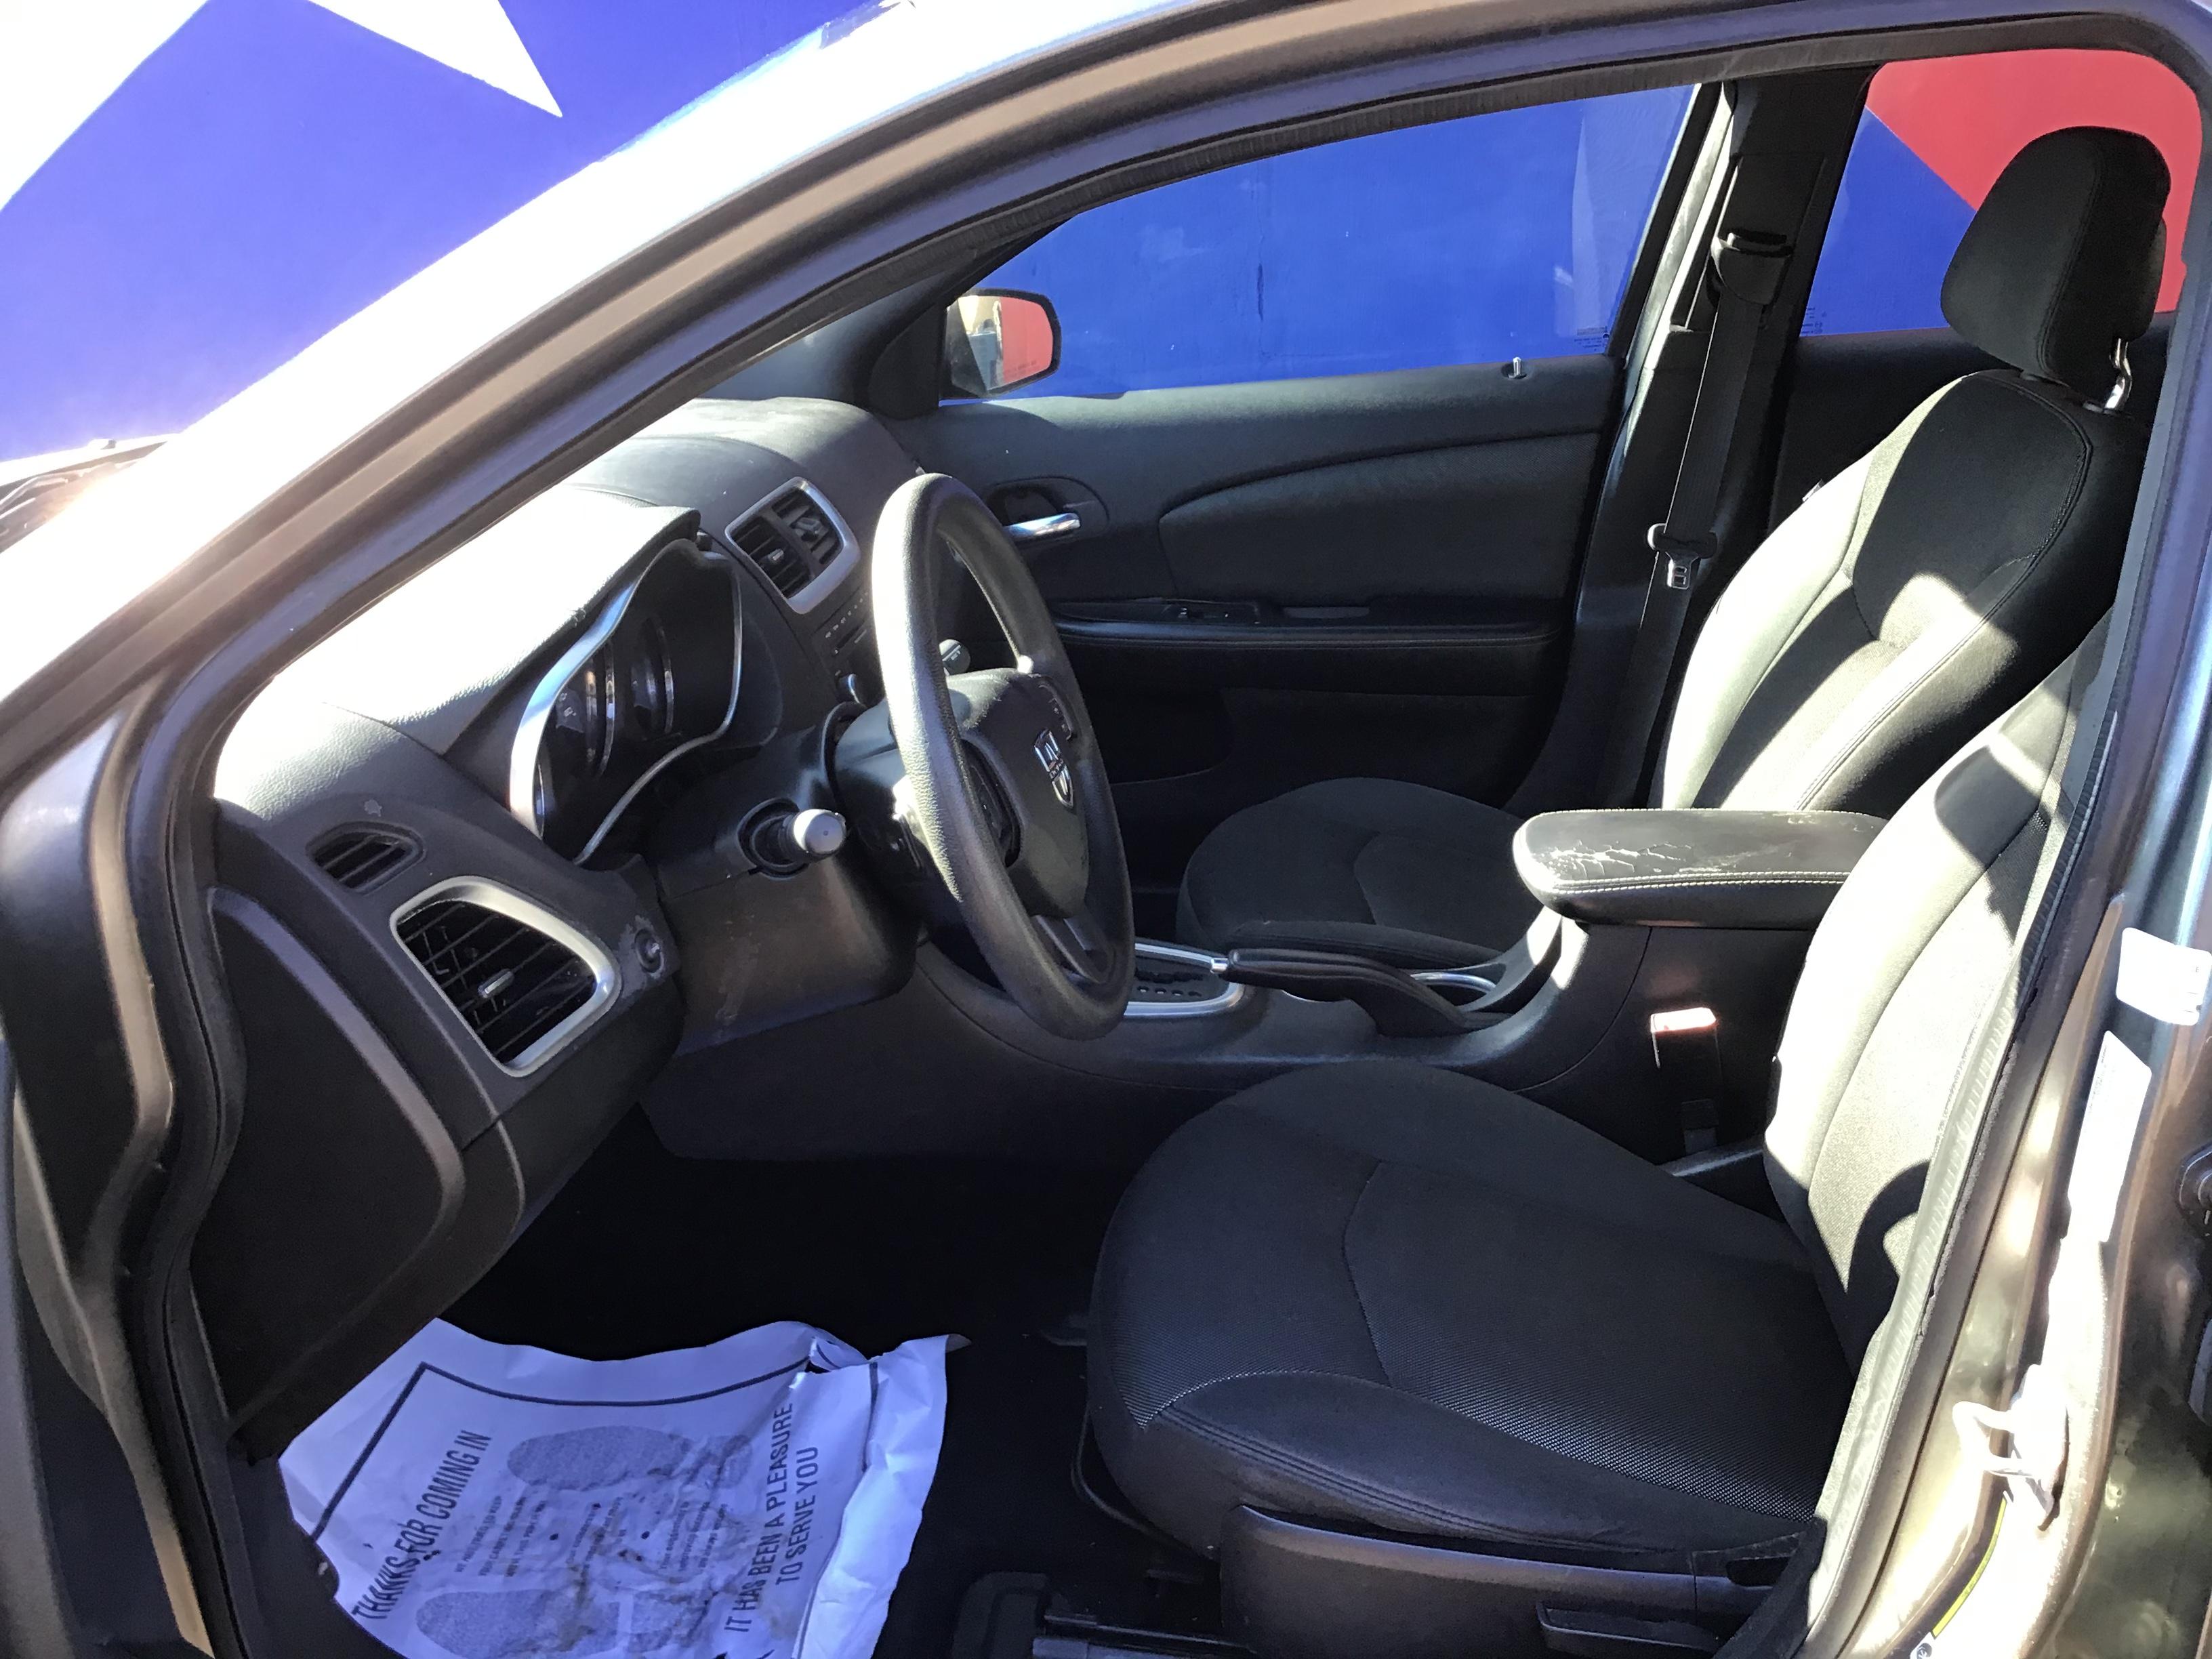 used vehicle - Sedan DODGE AVENGER 2013